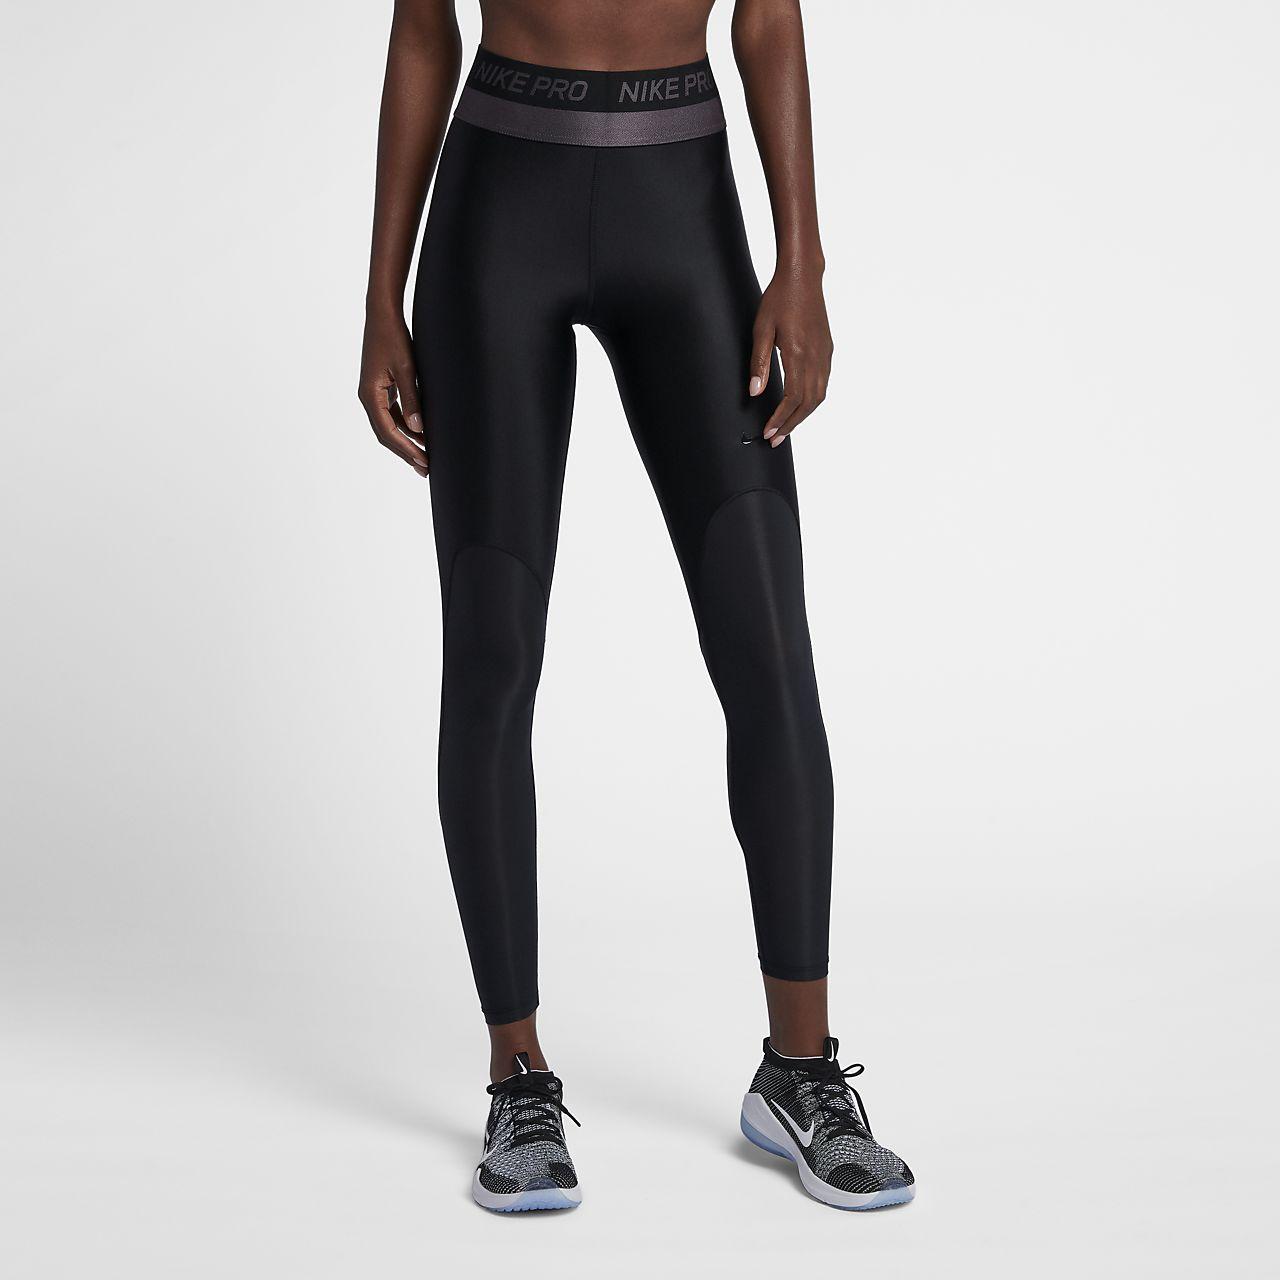 2bce470cdb5c4 Nike Pro HyperCool Women's Mid-Rise Training Tights. Nike.com GB